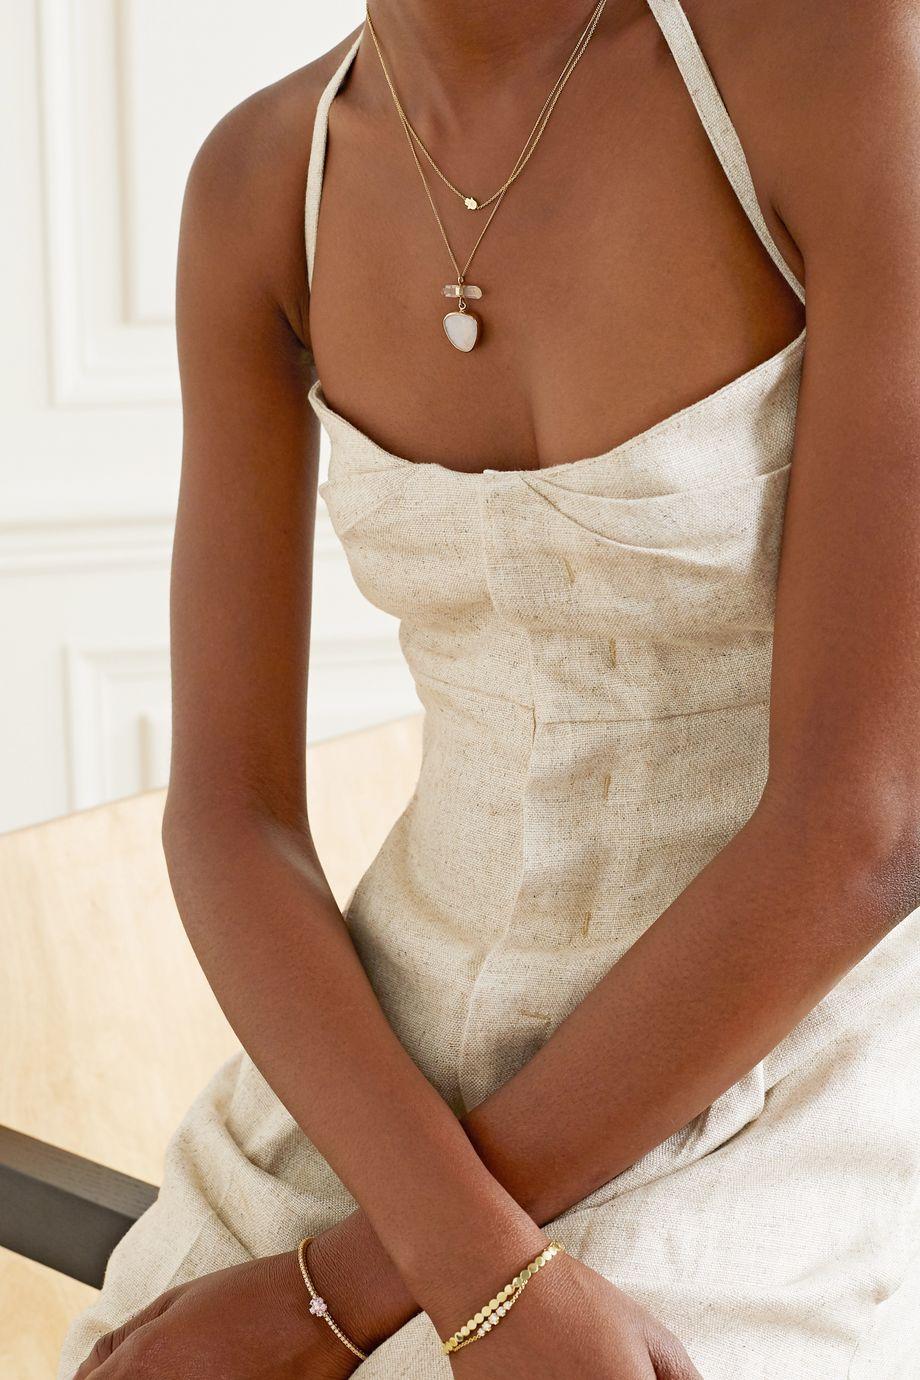 Melissa Joy Manning 14-karat gold, sterling silver, amethyst and opal necklace